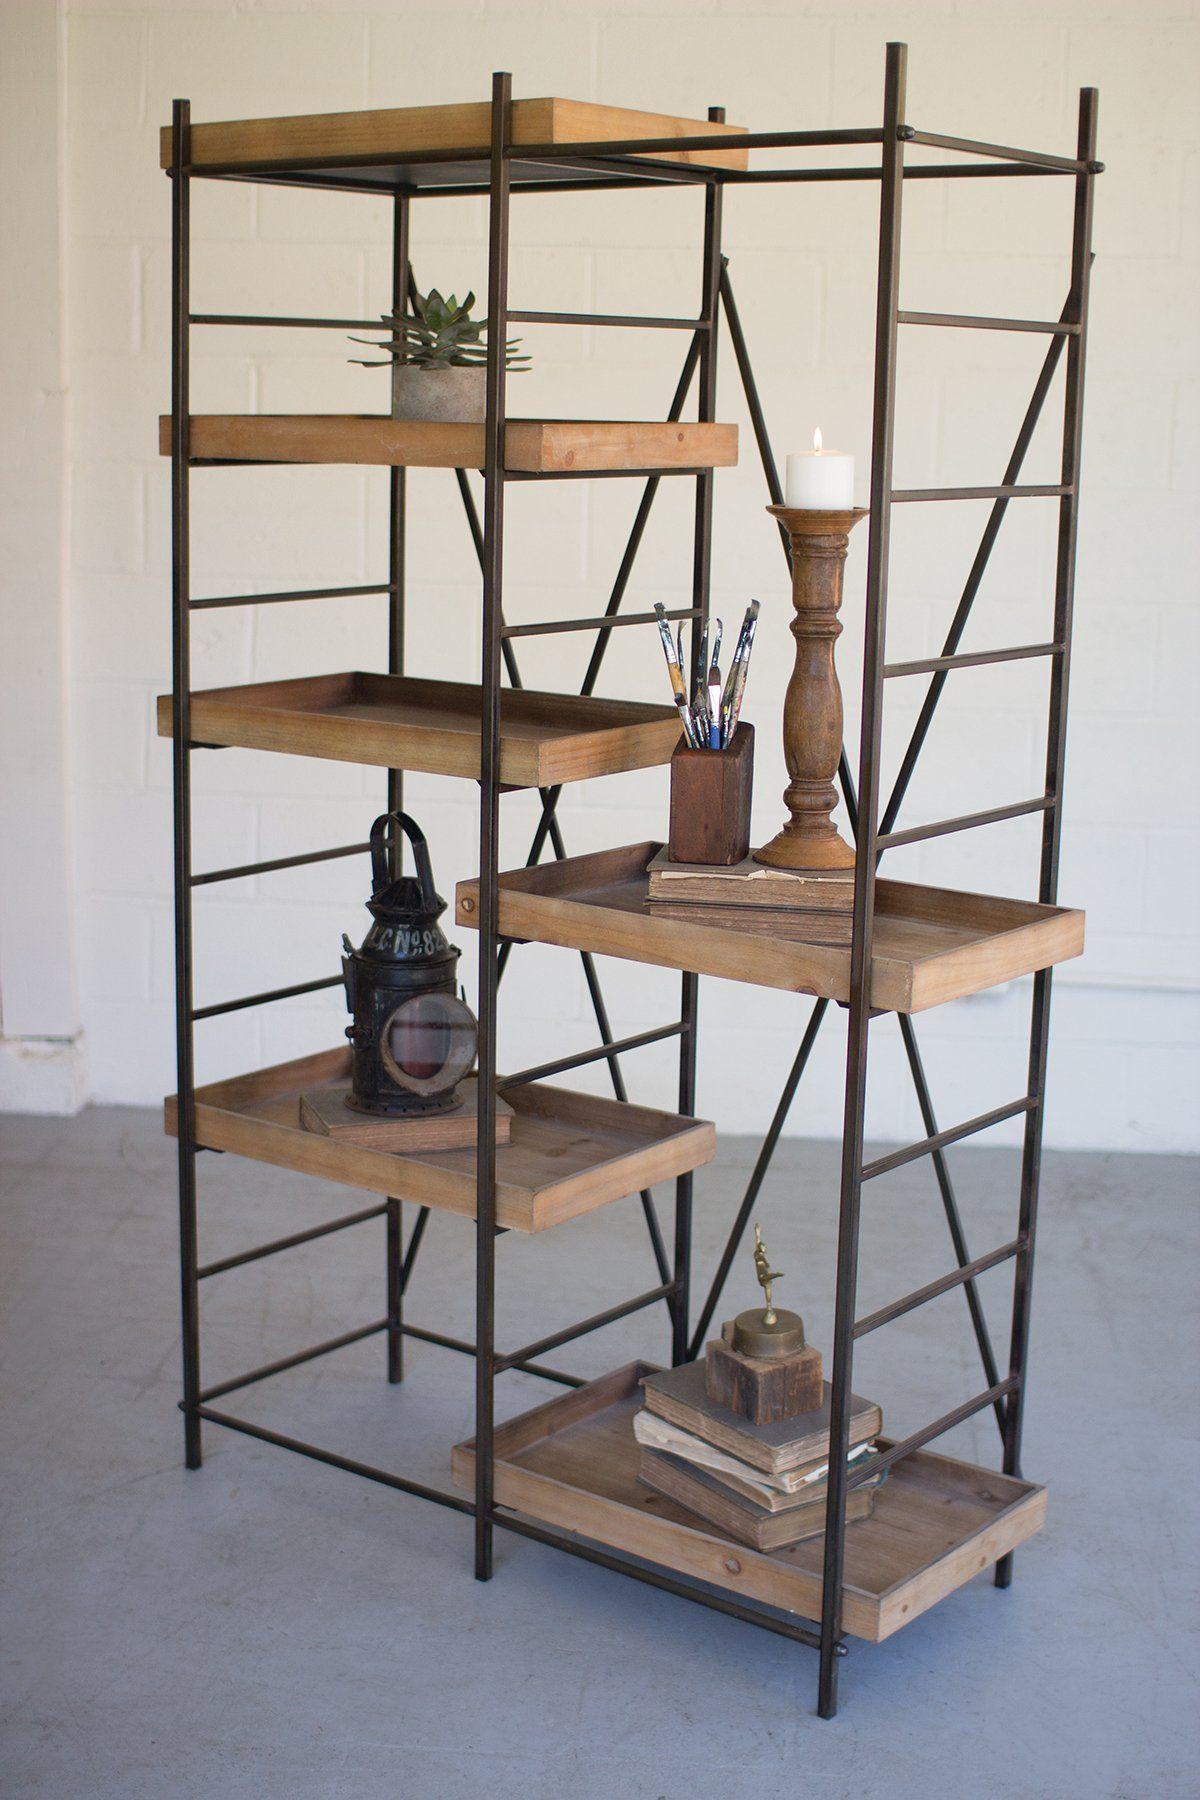 Iron Shelving Unit W Six Adjustable Wooden Shelves Wood Shelving Units Metal Shelves Metal Shelving Units